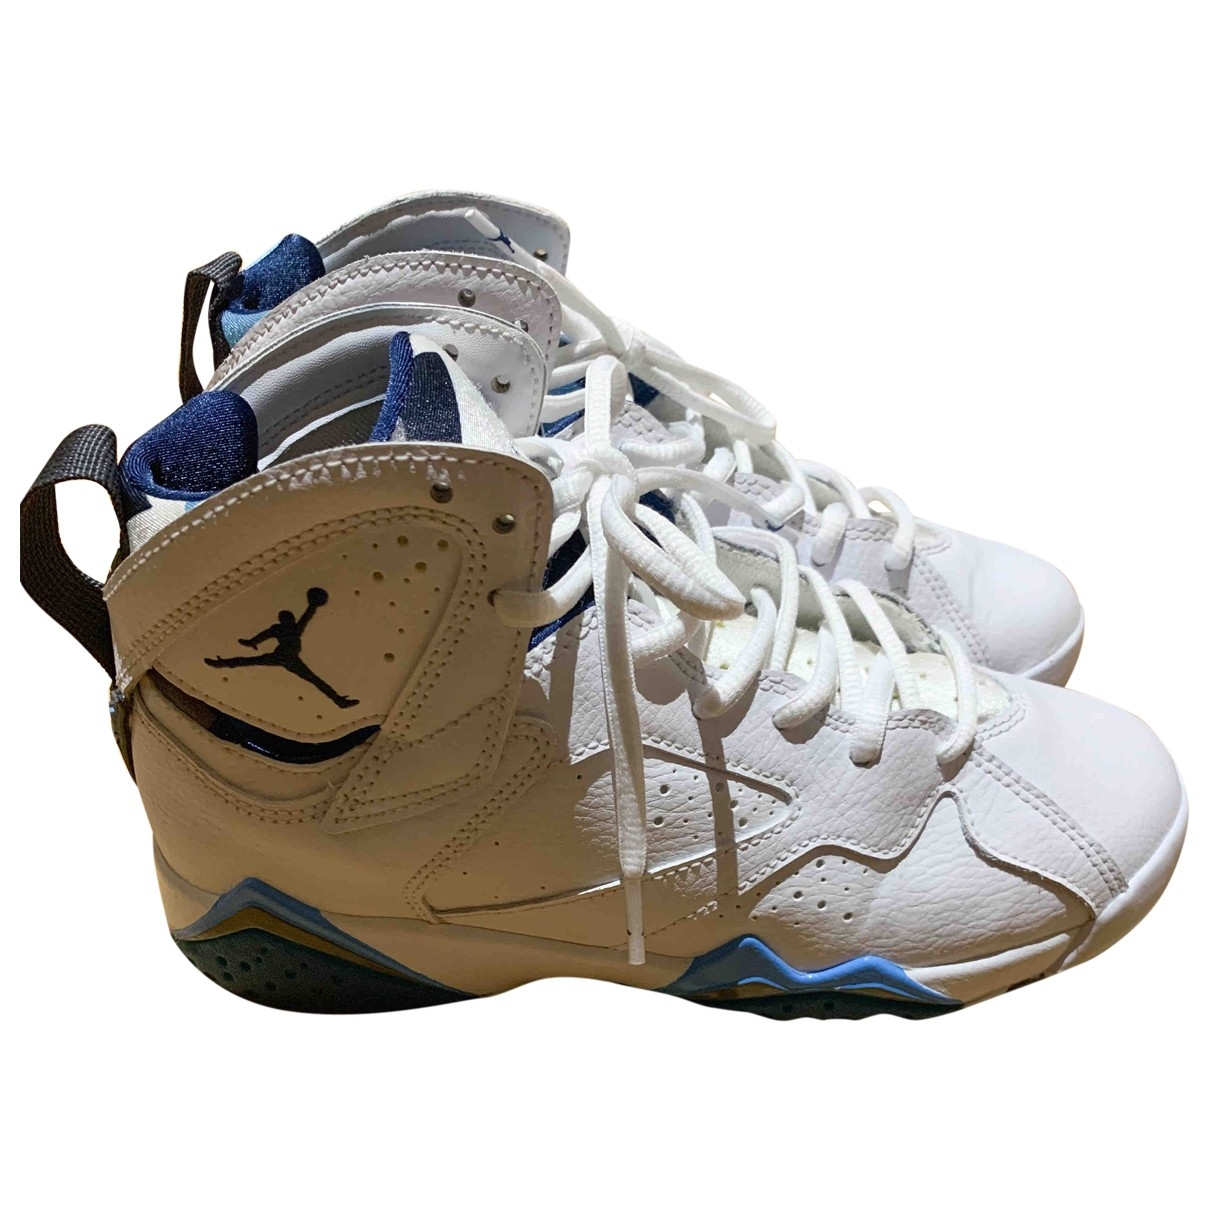 Jordan Air Jordan 7 White Leather Trainers for Women 36.5 EU